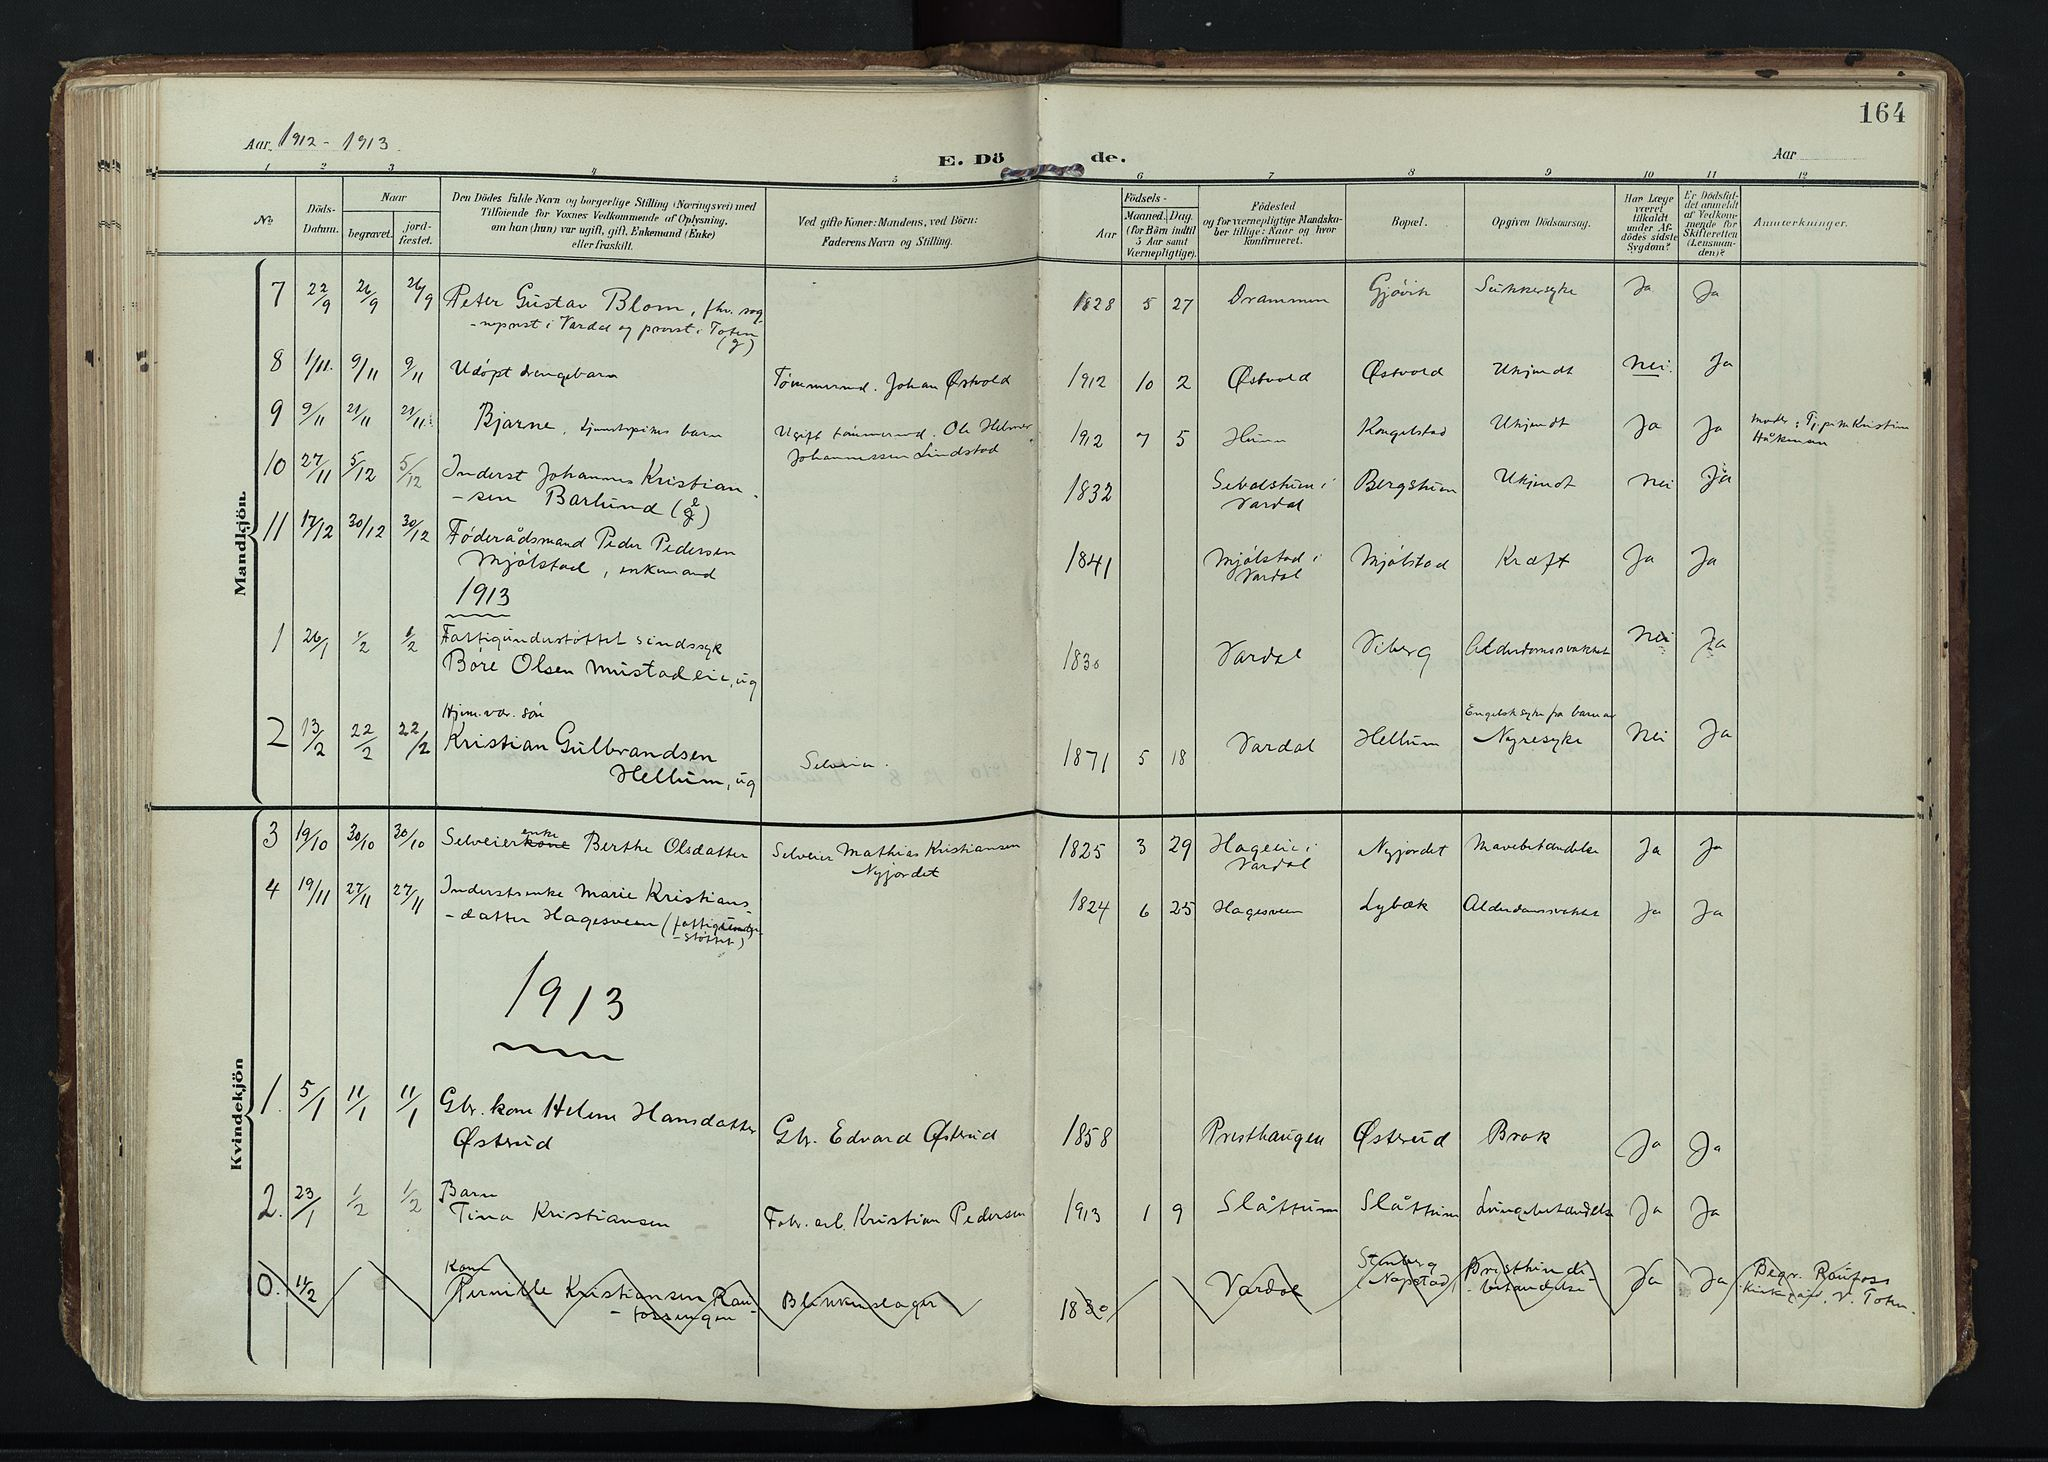 SAH, Vardal prestekontor, H/Ha/Haa/L0020: Ministerialbok nr. 20, 1907-1921, s. 164